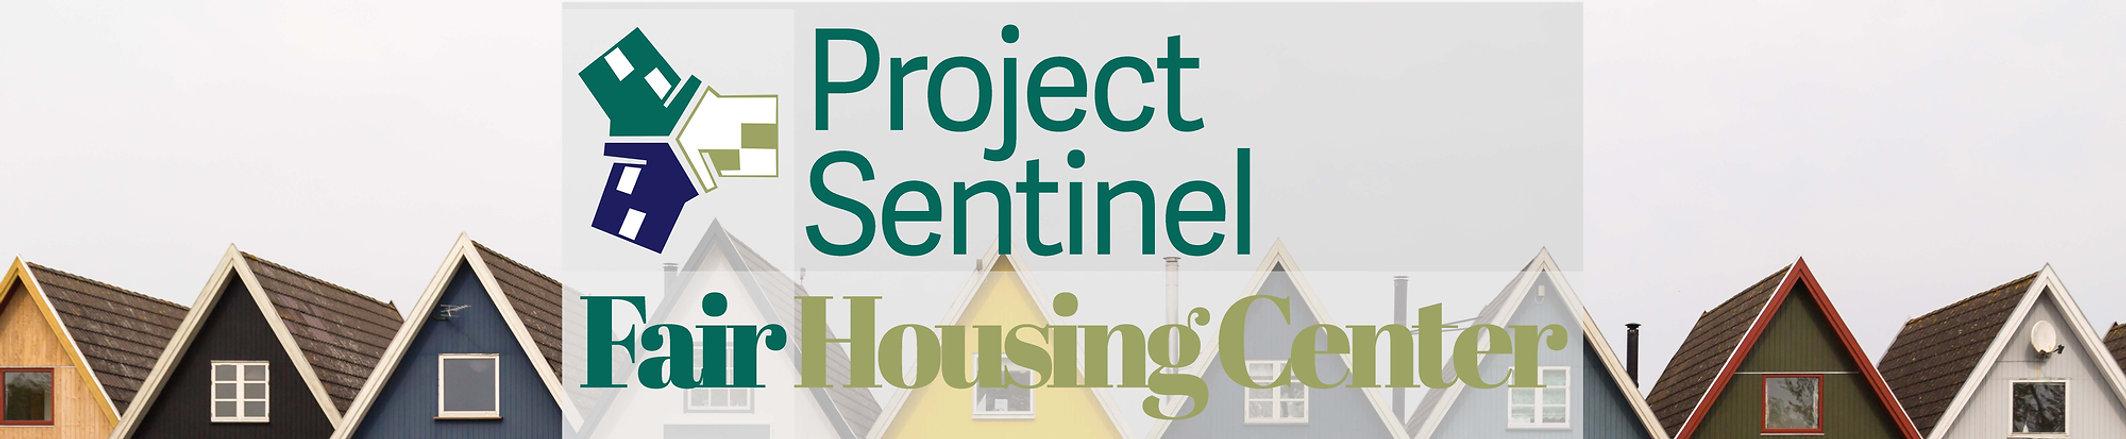 fair housing banner.jpg